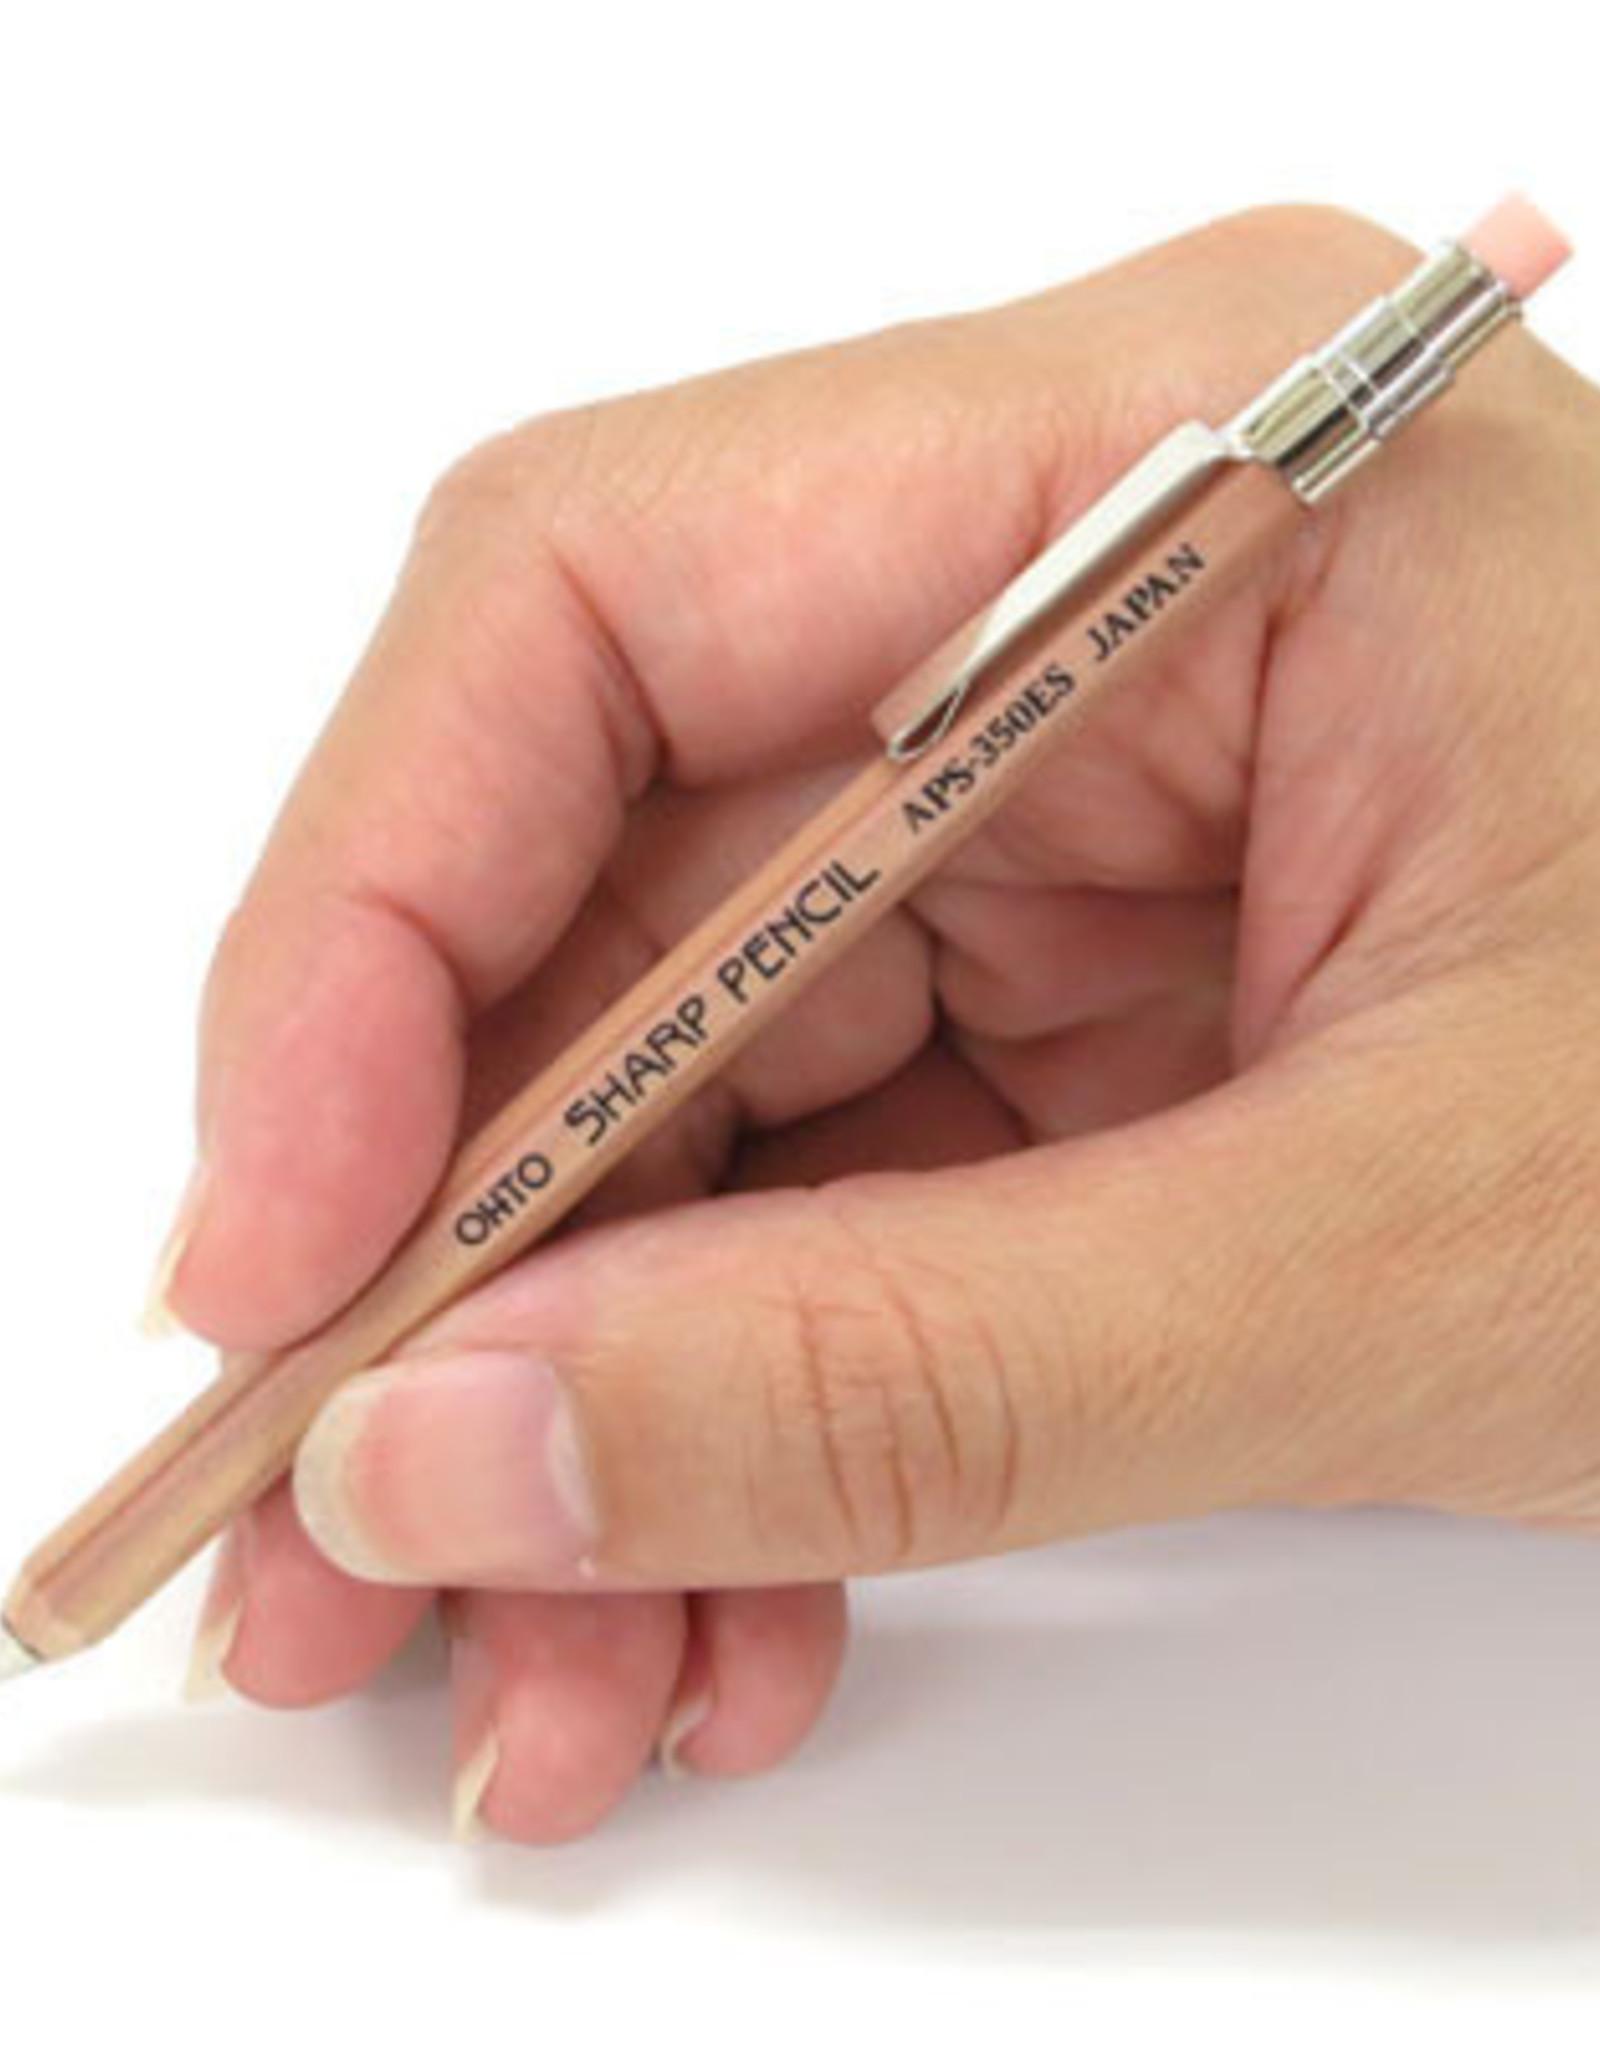 Ohto Wooden Mechanical Pencil Mini w/Eraser & Clip 0.5 mm